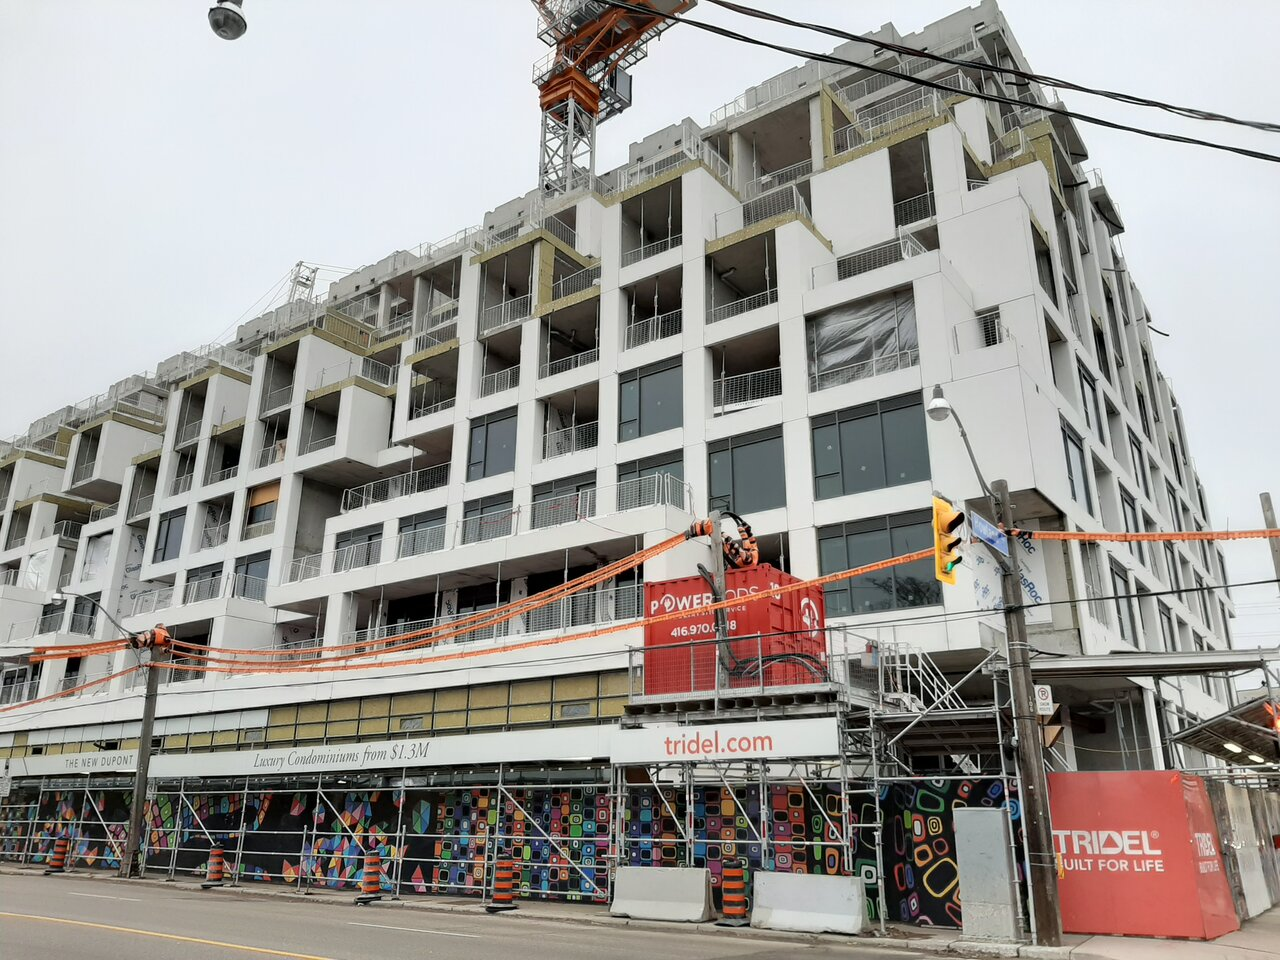 Bianca Condos, Tridel, Teeple Architects, Toronto